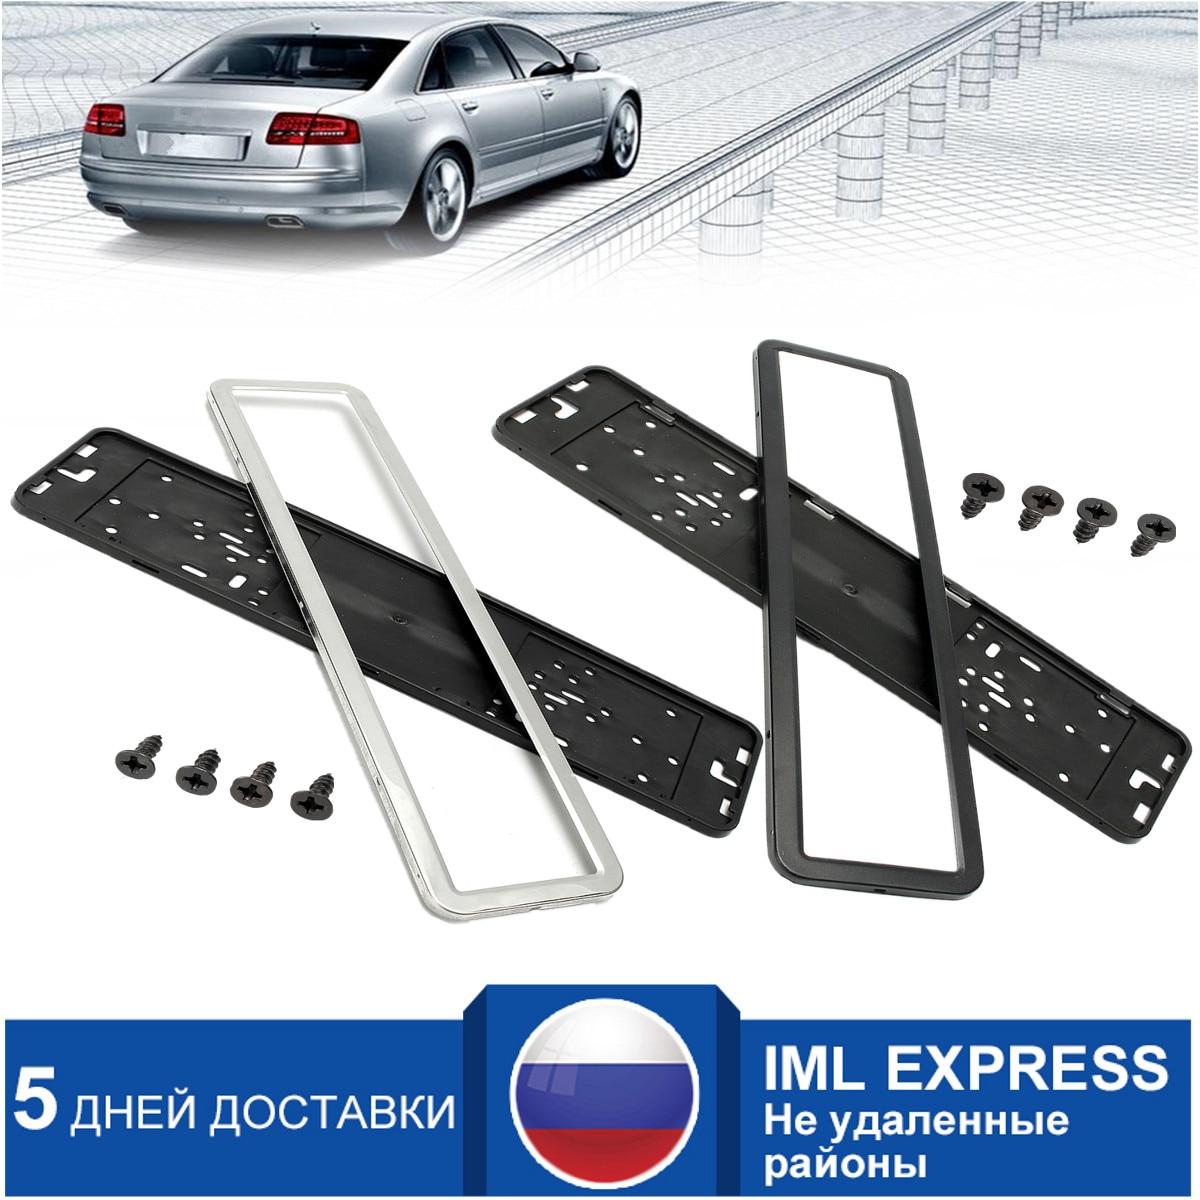 1 ensemble inox européen allemand russe 8K voiture plaque d'immatriculation cadre porte-plaque d'immatriculation